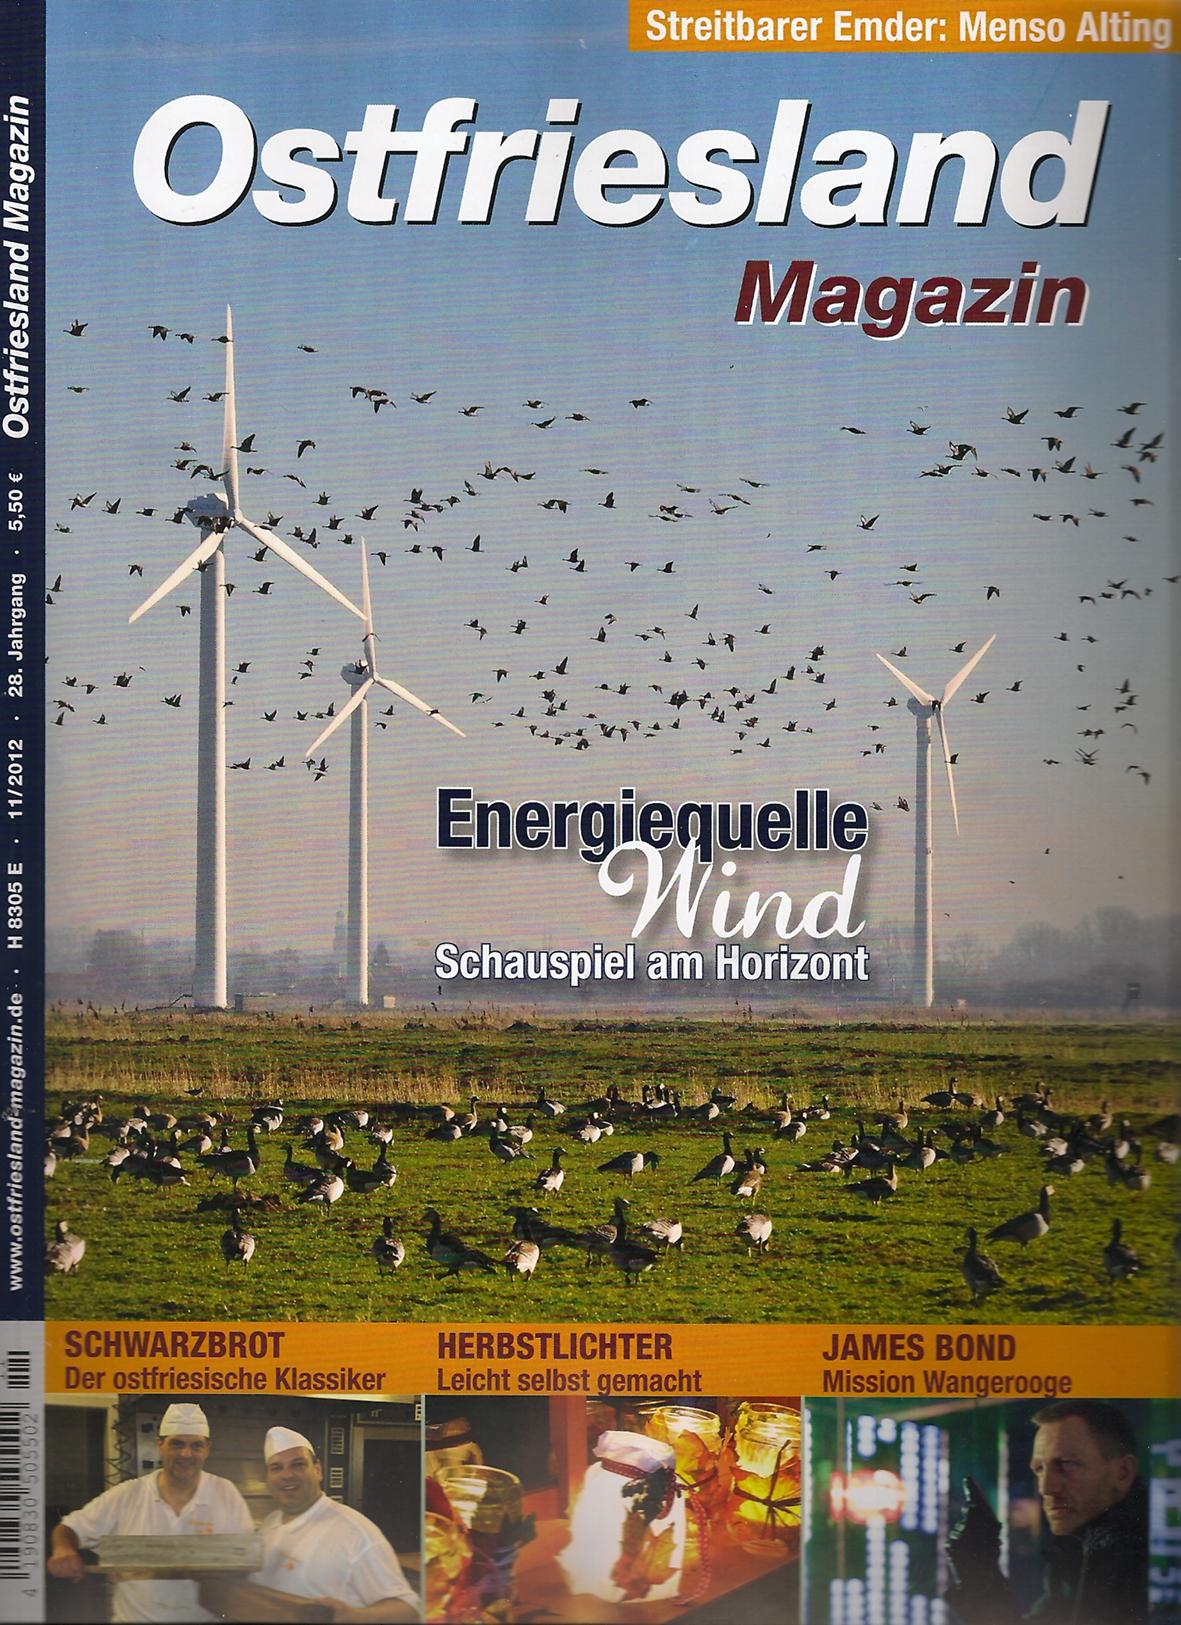 Ostfriesland Magazin - 11/2012